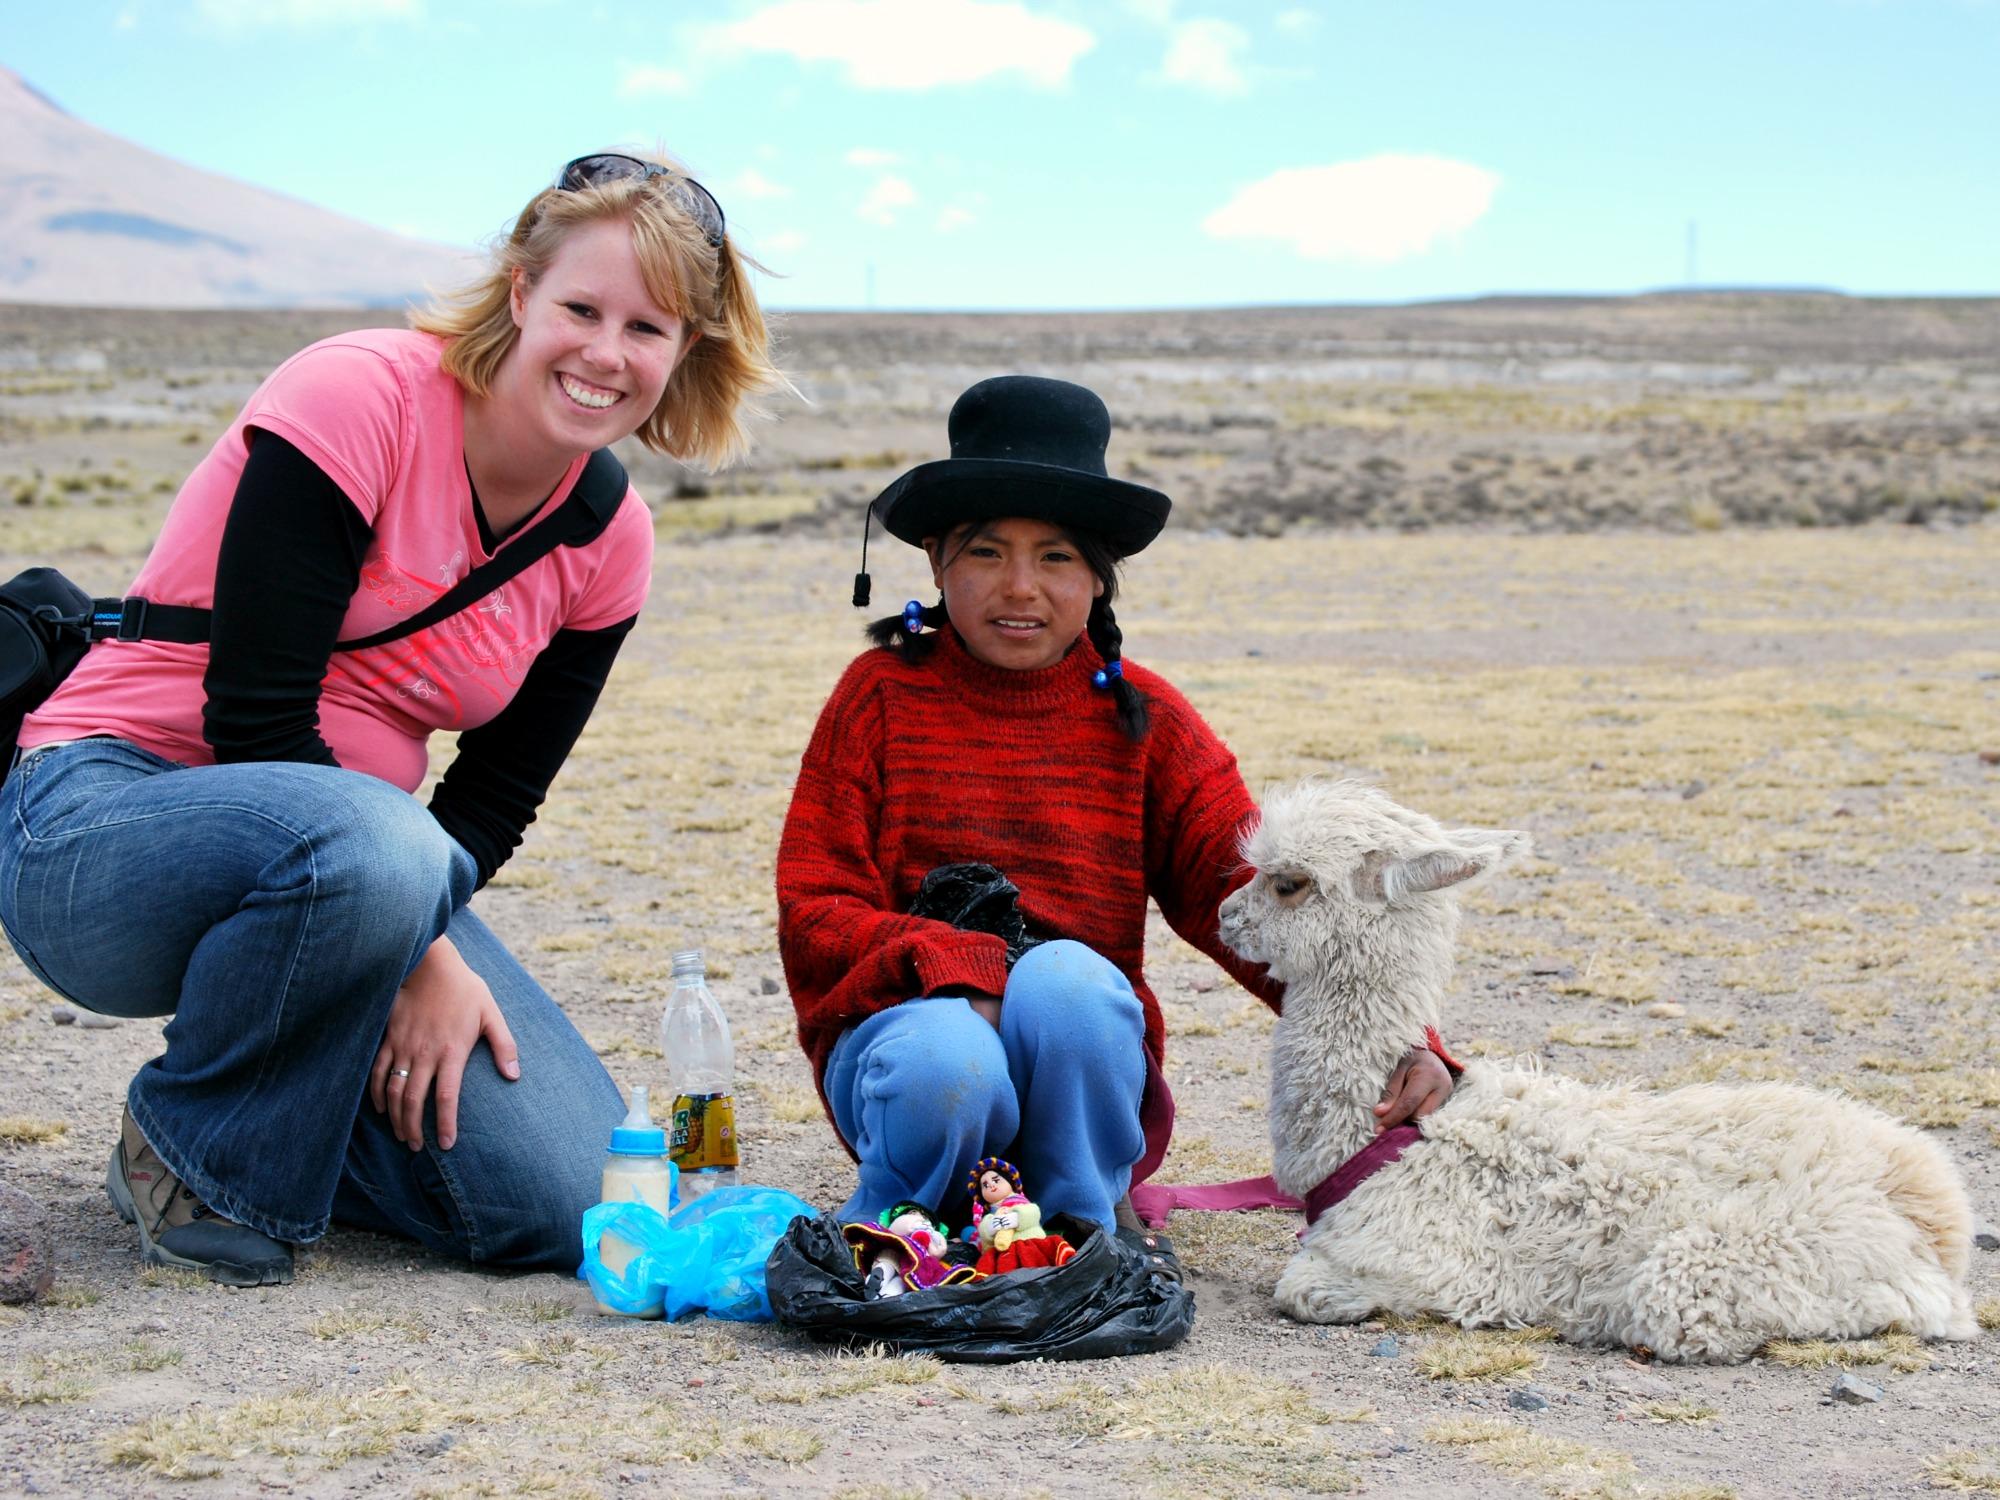 Peru reis - Onderweg een lama tegenkomen